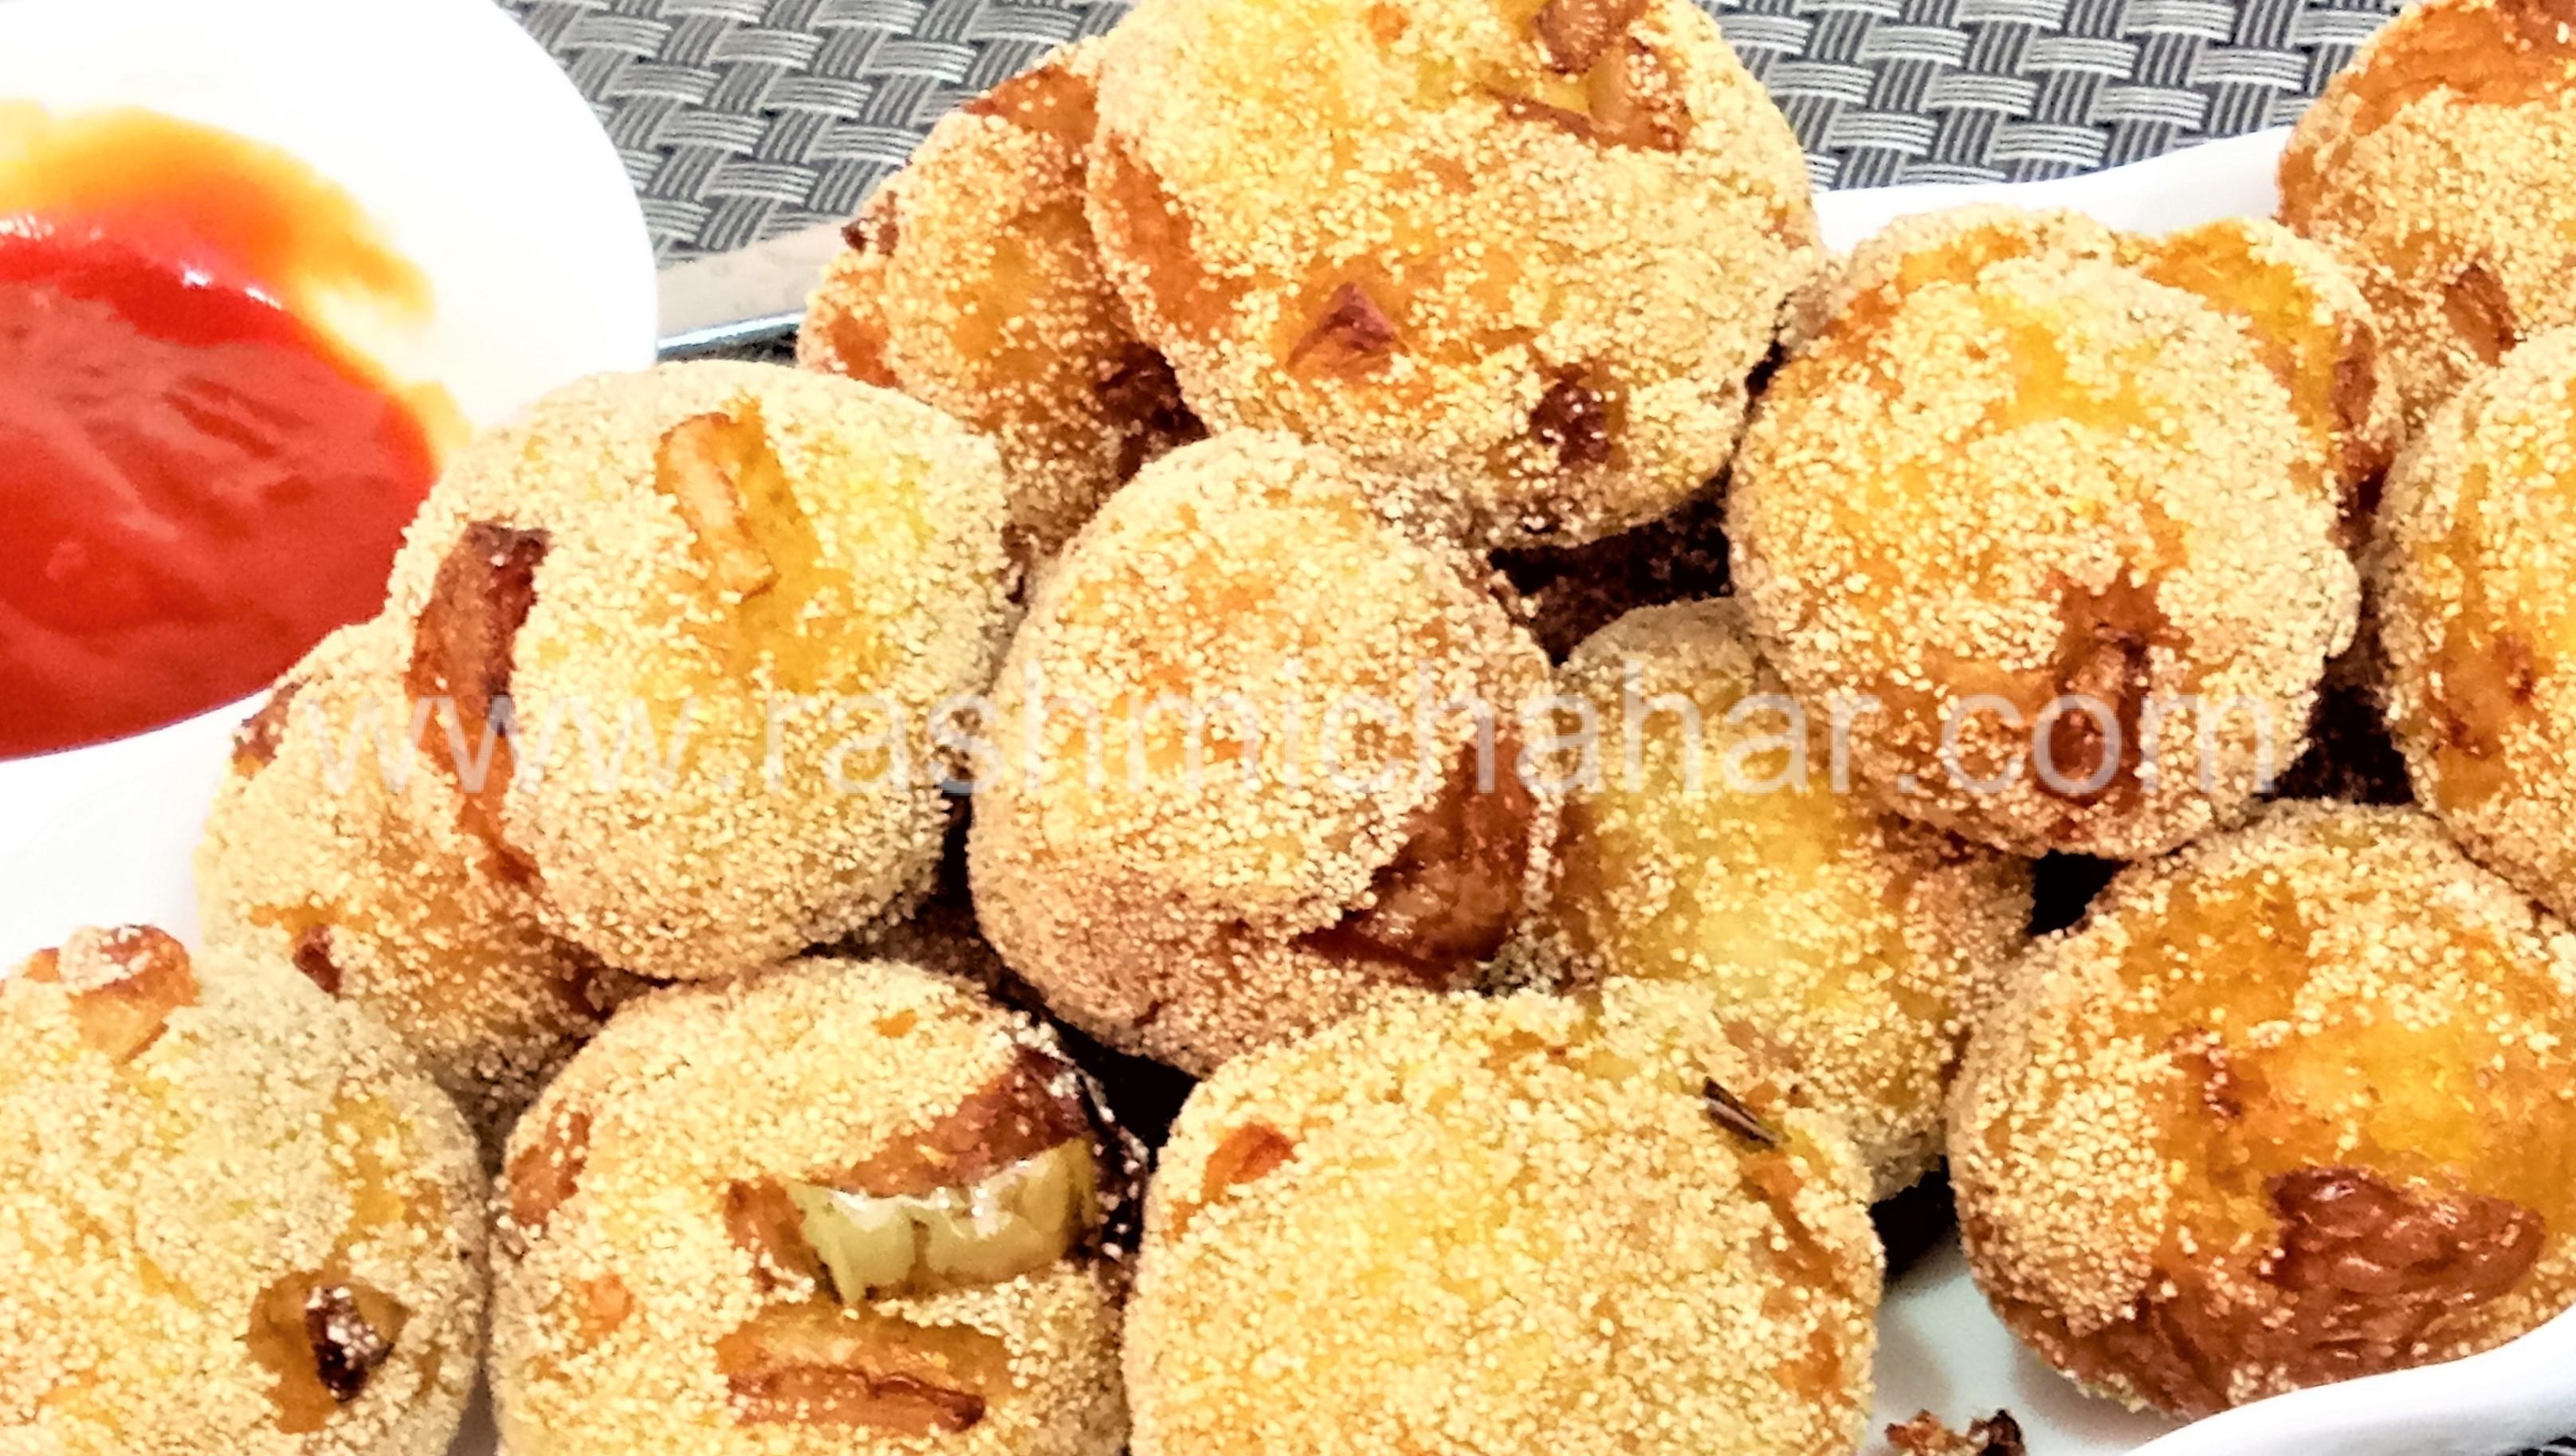 पोहा पकोड़ा रेसिपी | Poha Pakora Recipe| How To Make Poha Pakoda